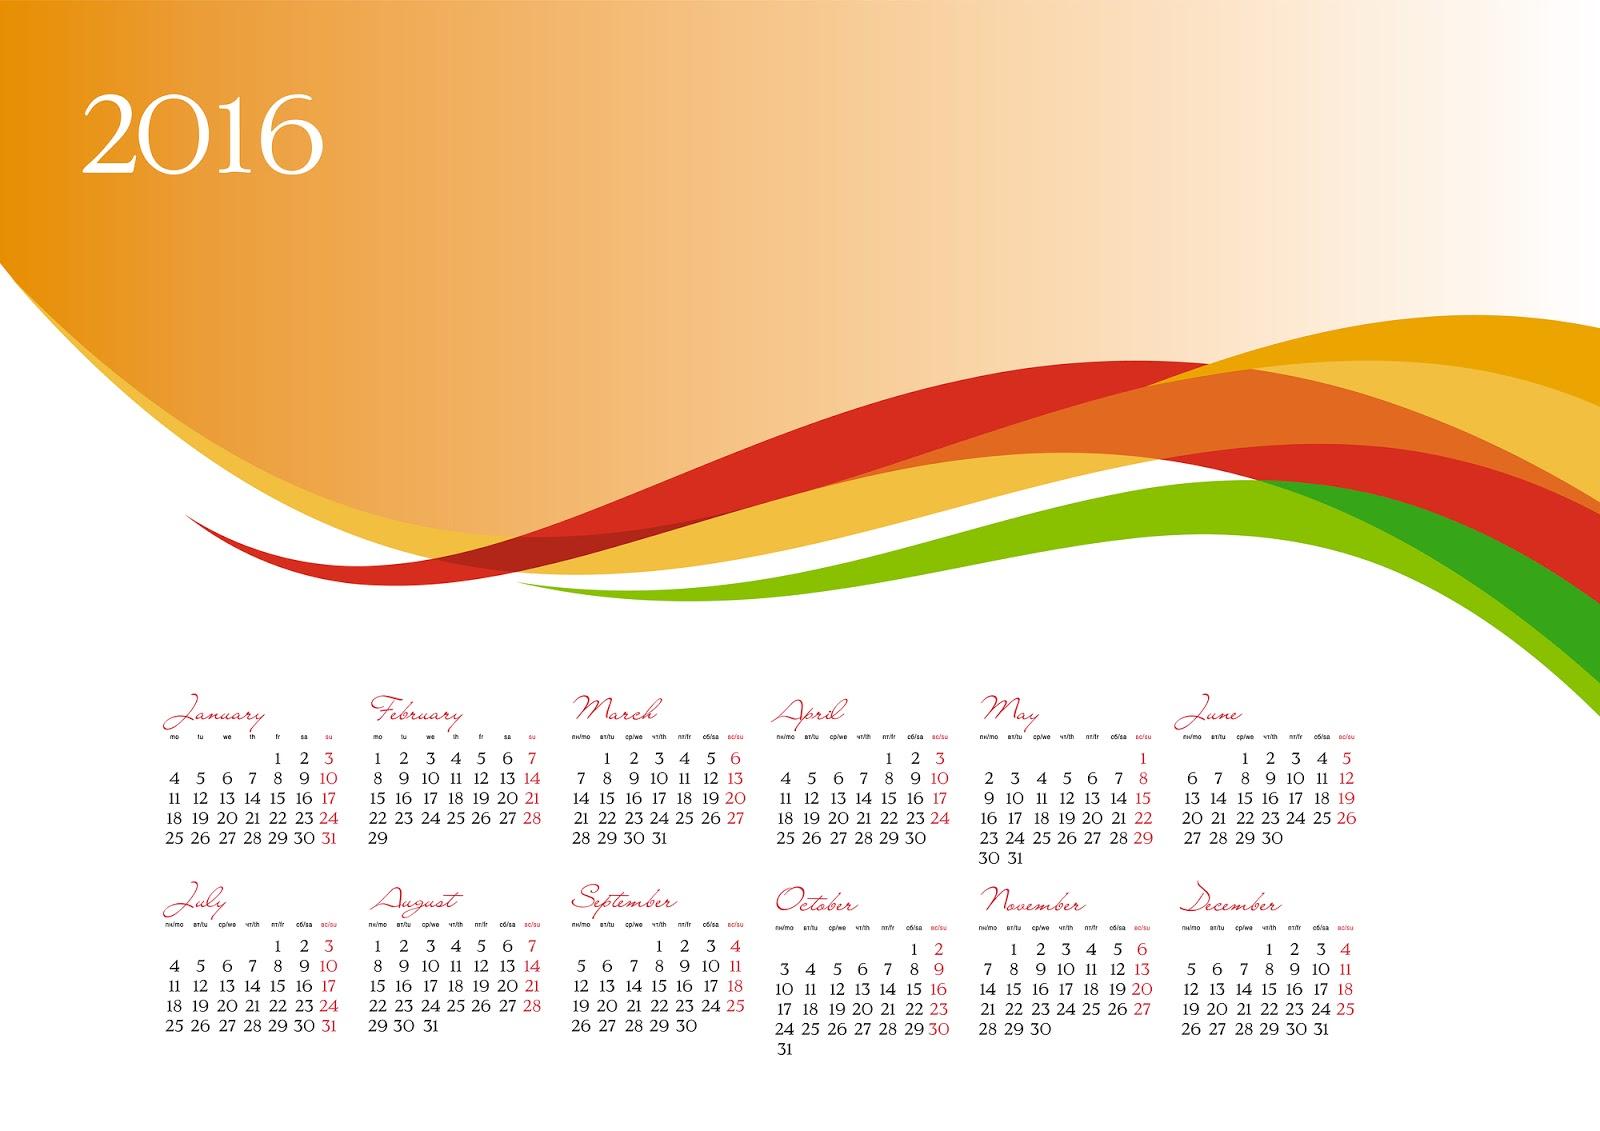 Wallpaper Calendar 2016 View HD Image of HD Yearly Wallpaper Calendar 1600x1131